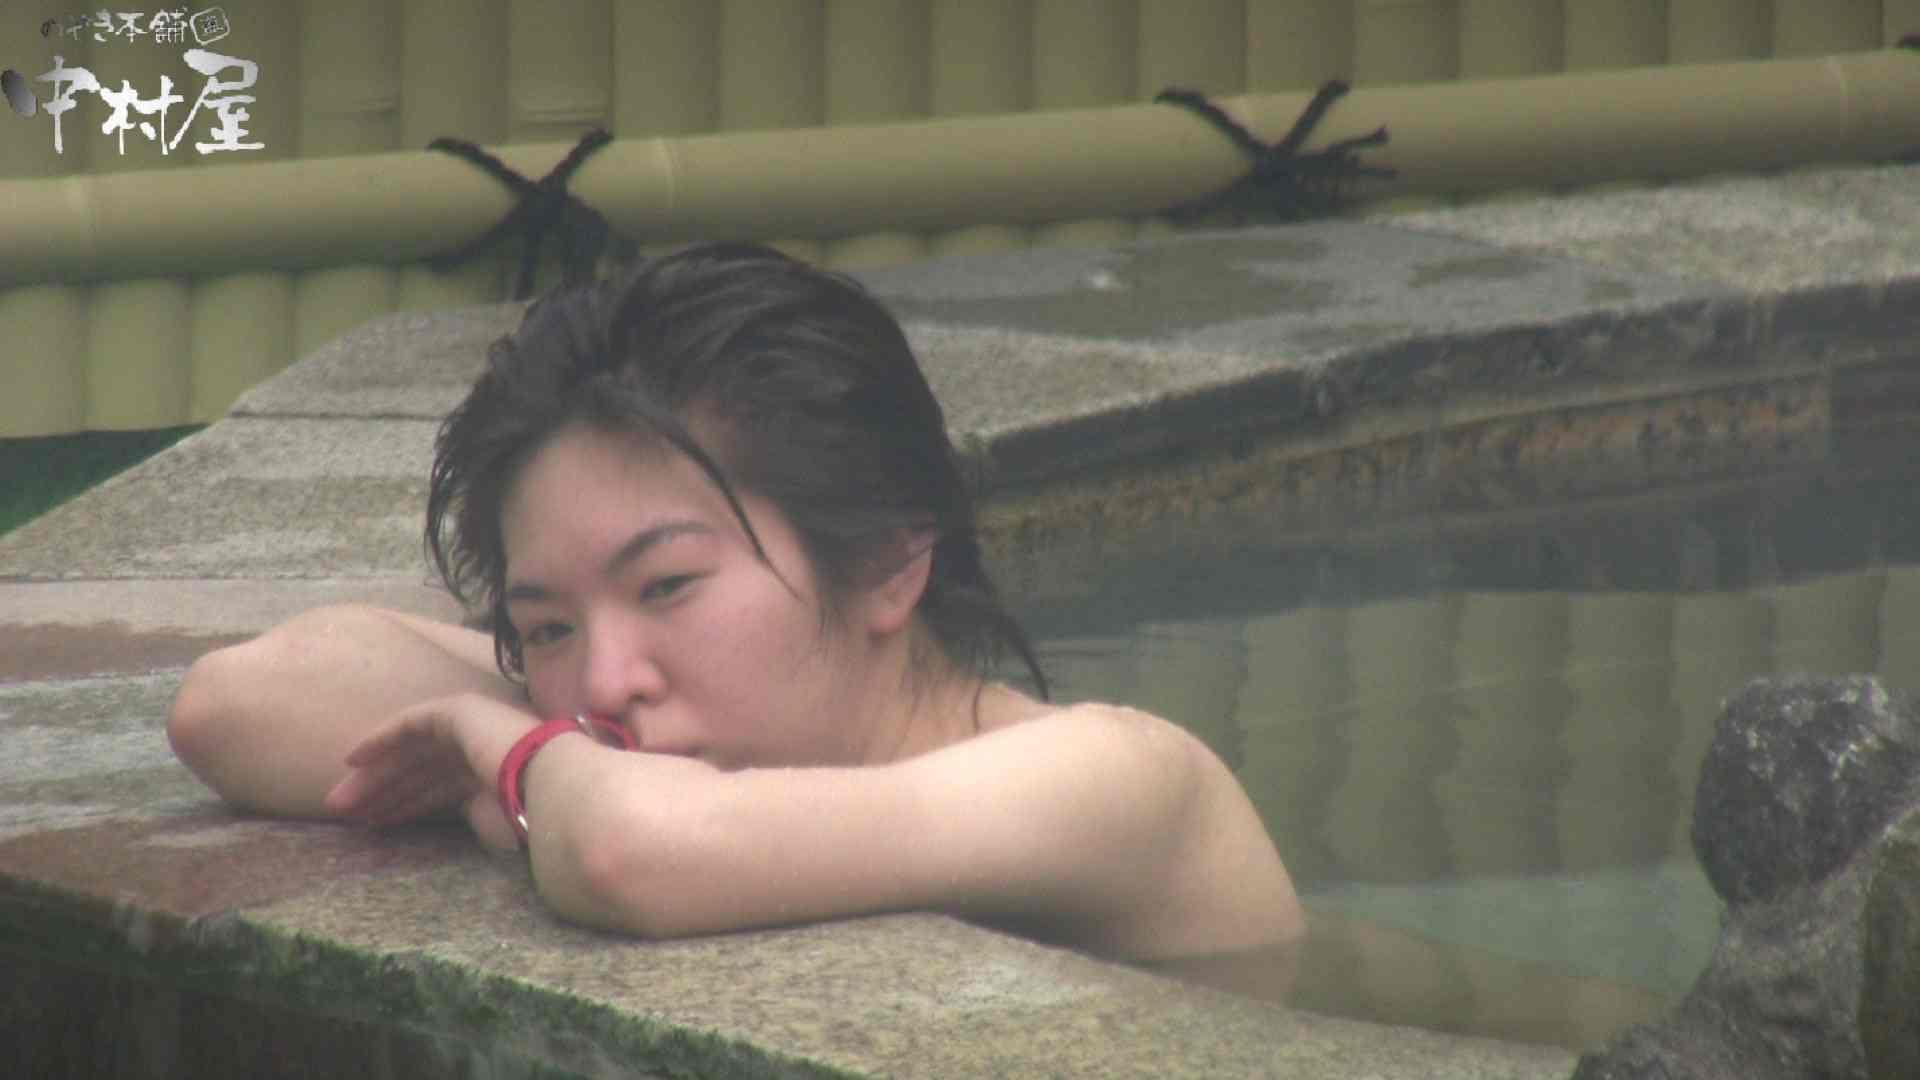 Aquaな露天風呂Vol.907 露天 盗撮ヌード画像 95連発 95